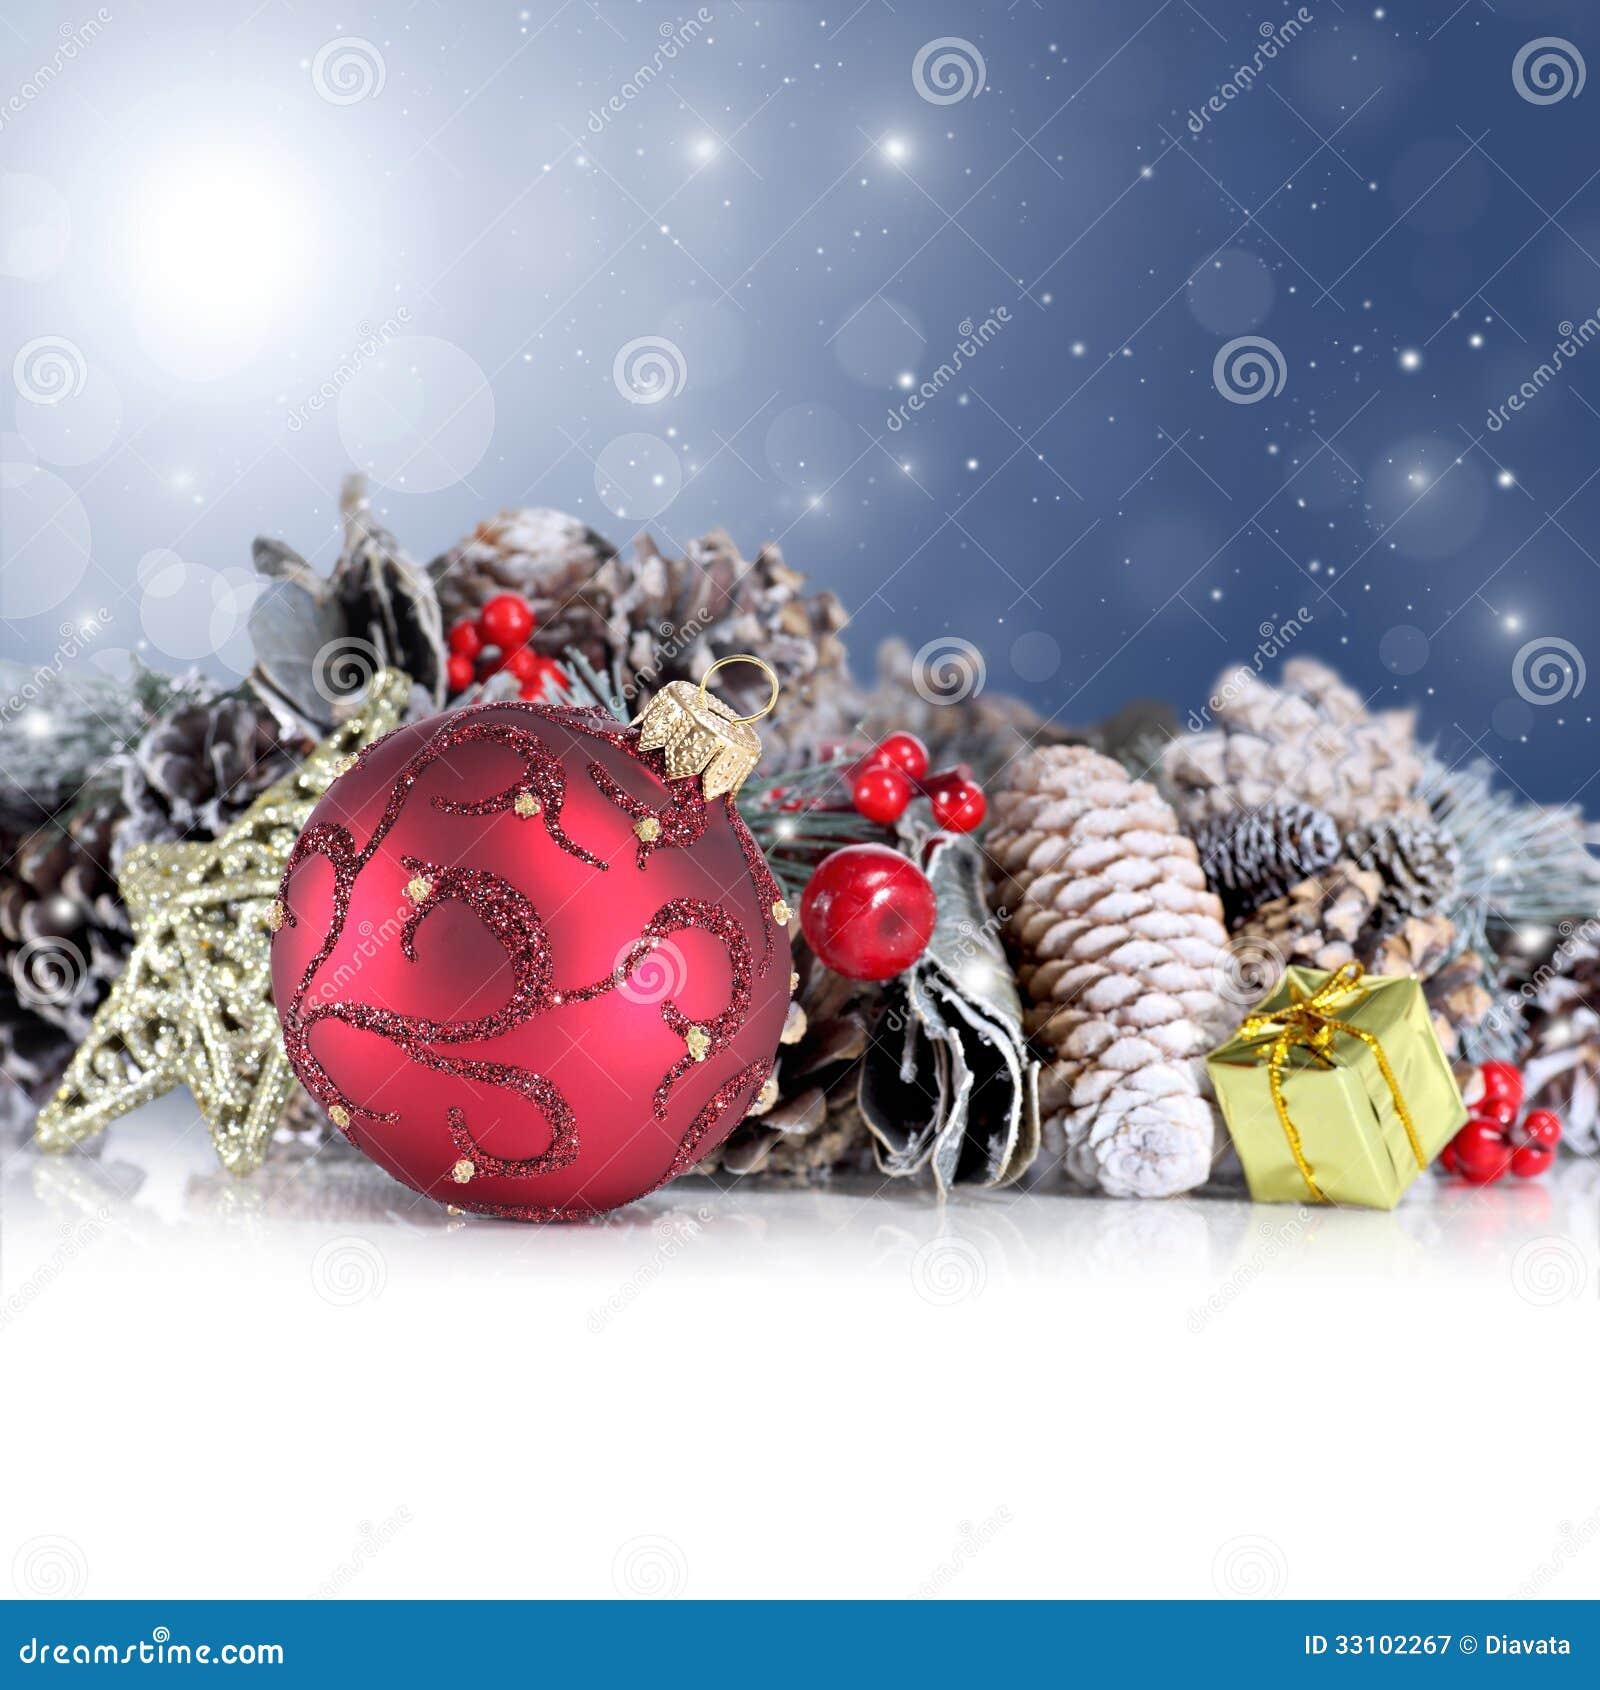 Kerstmisachtergrond met rode ornament, slinger en sneeuwvlokken